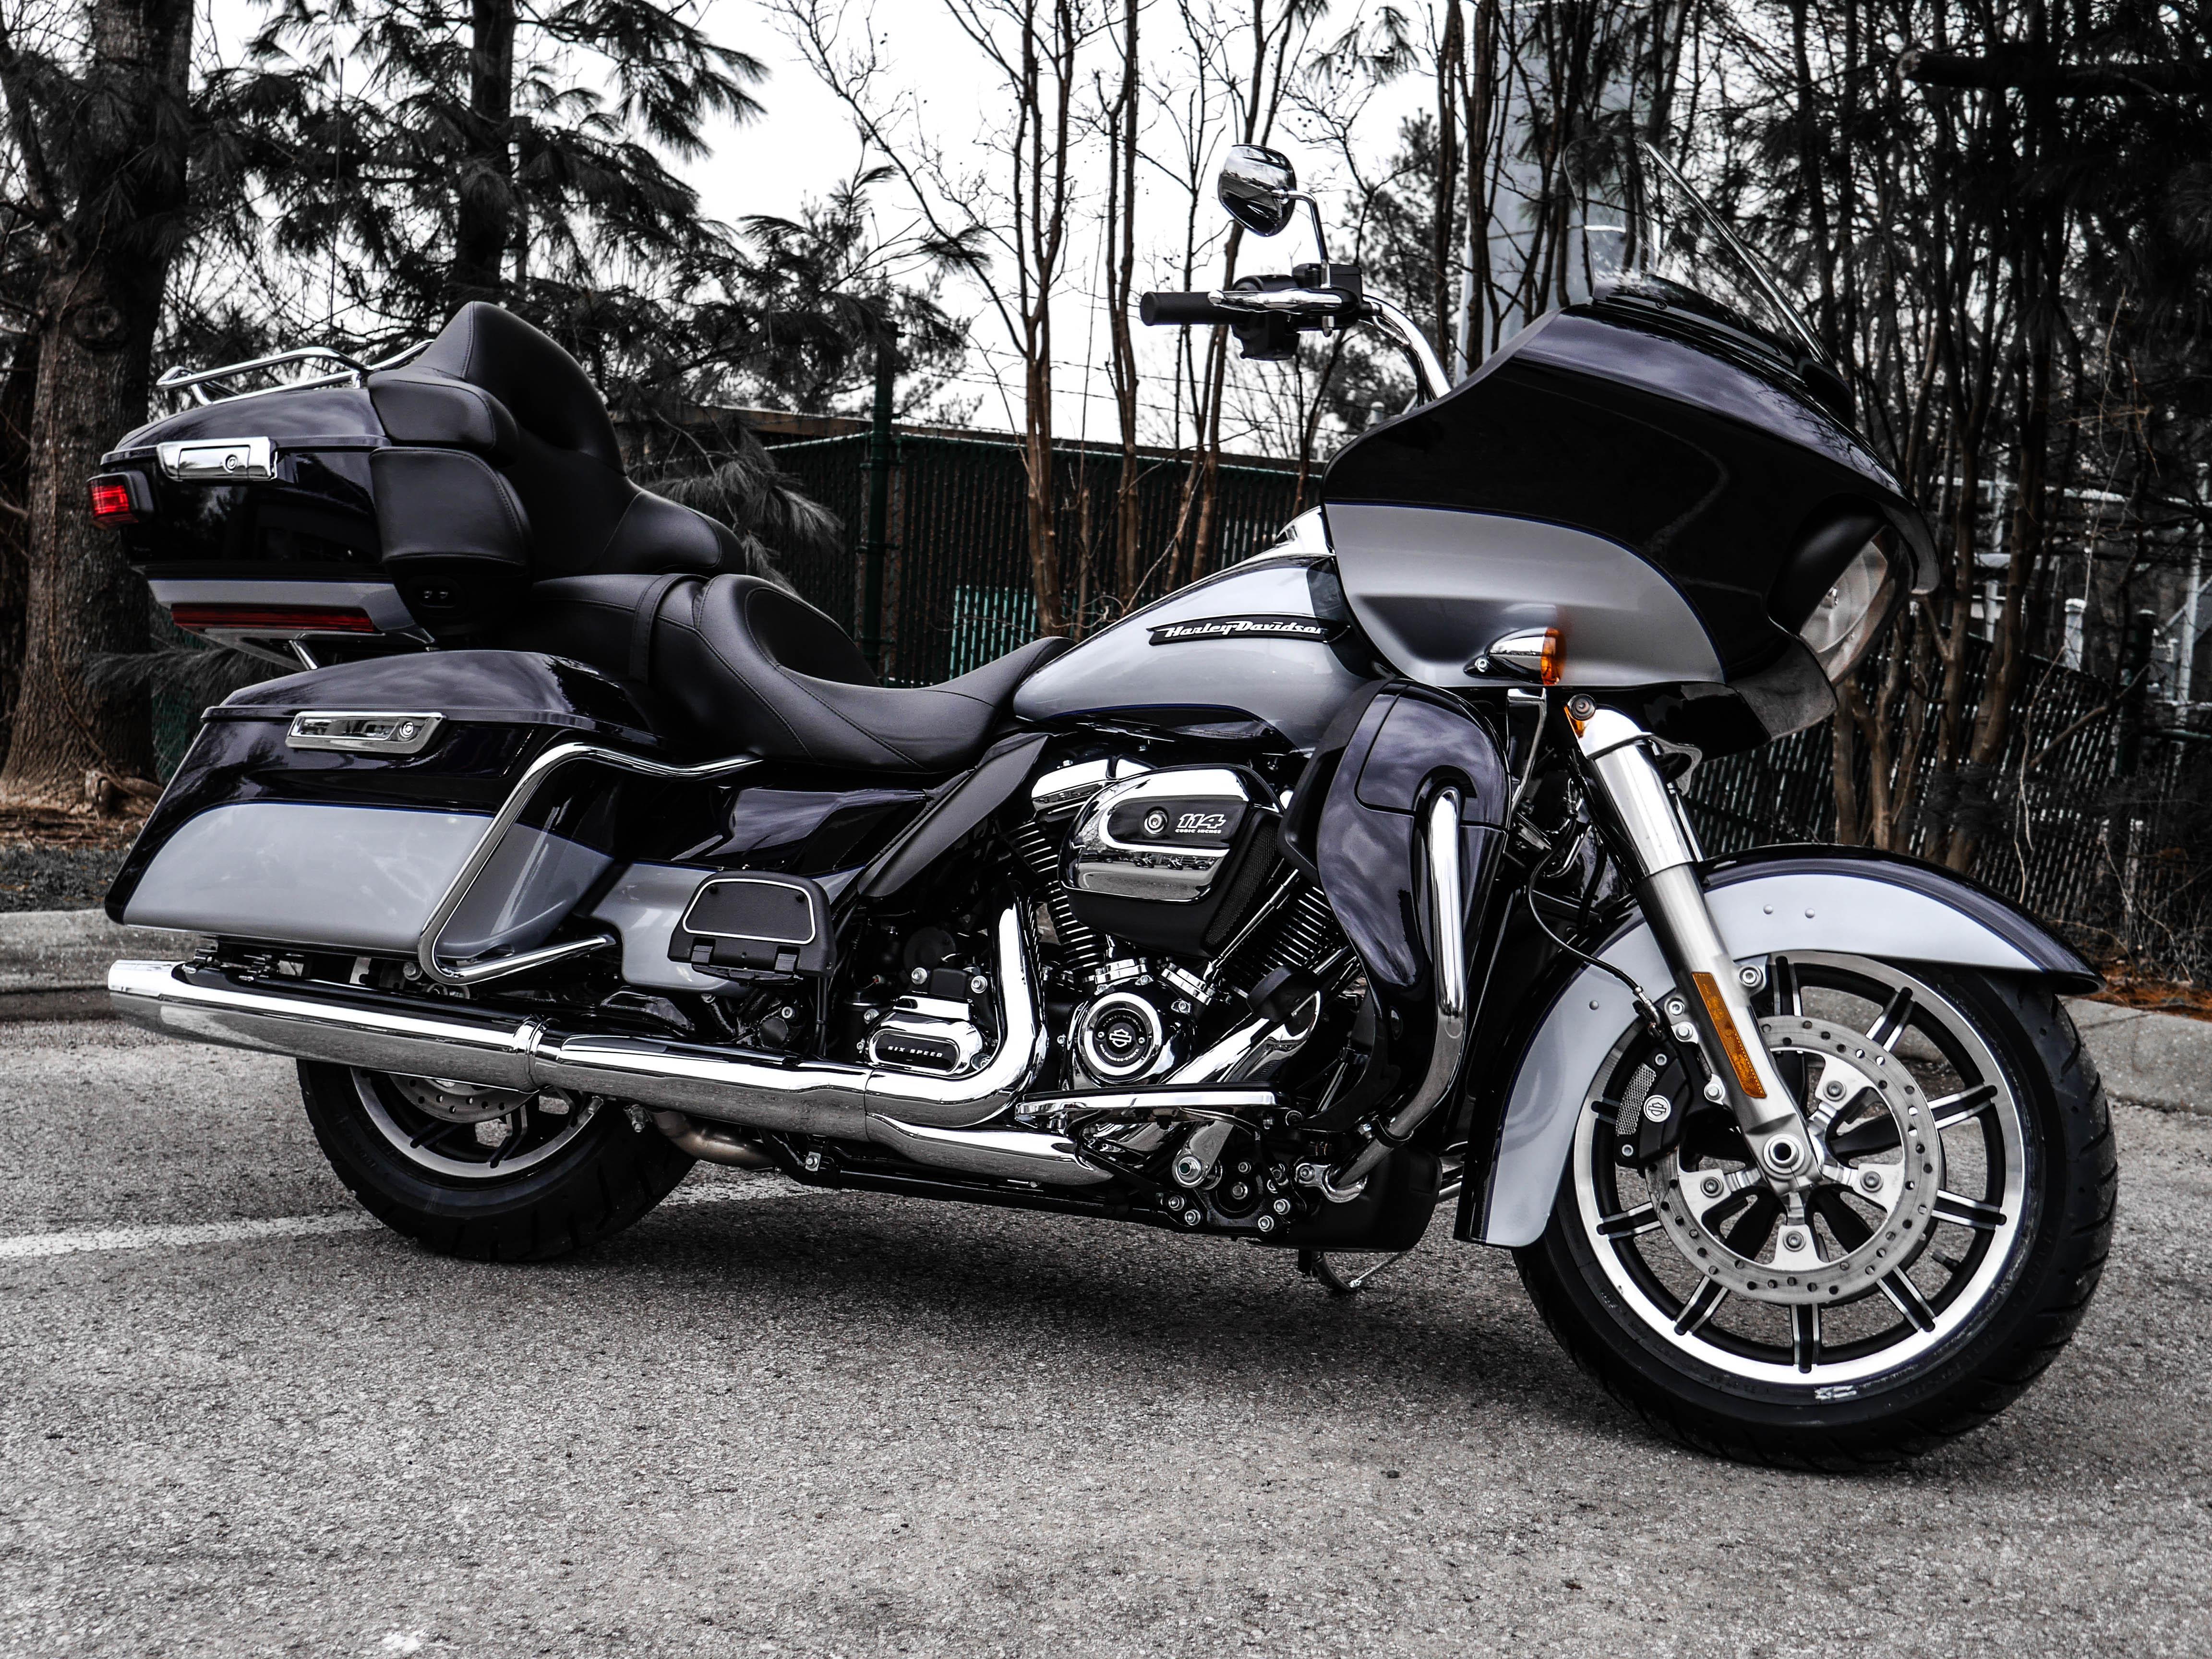 New 2019 Harley-Davidson Road Glide Ultra